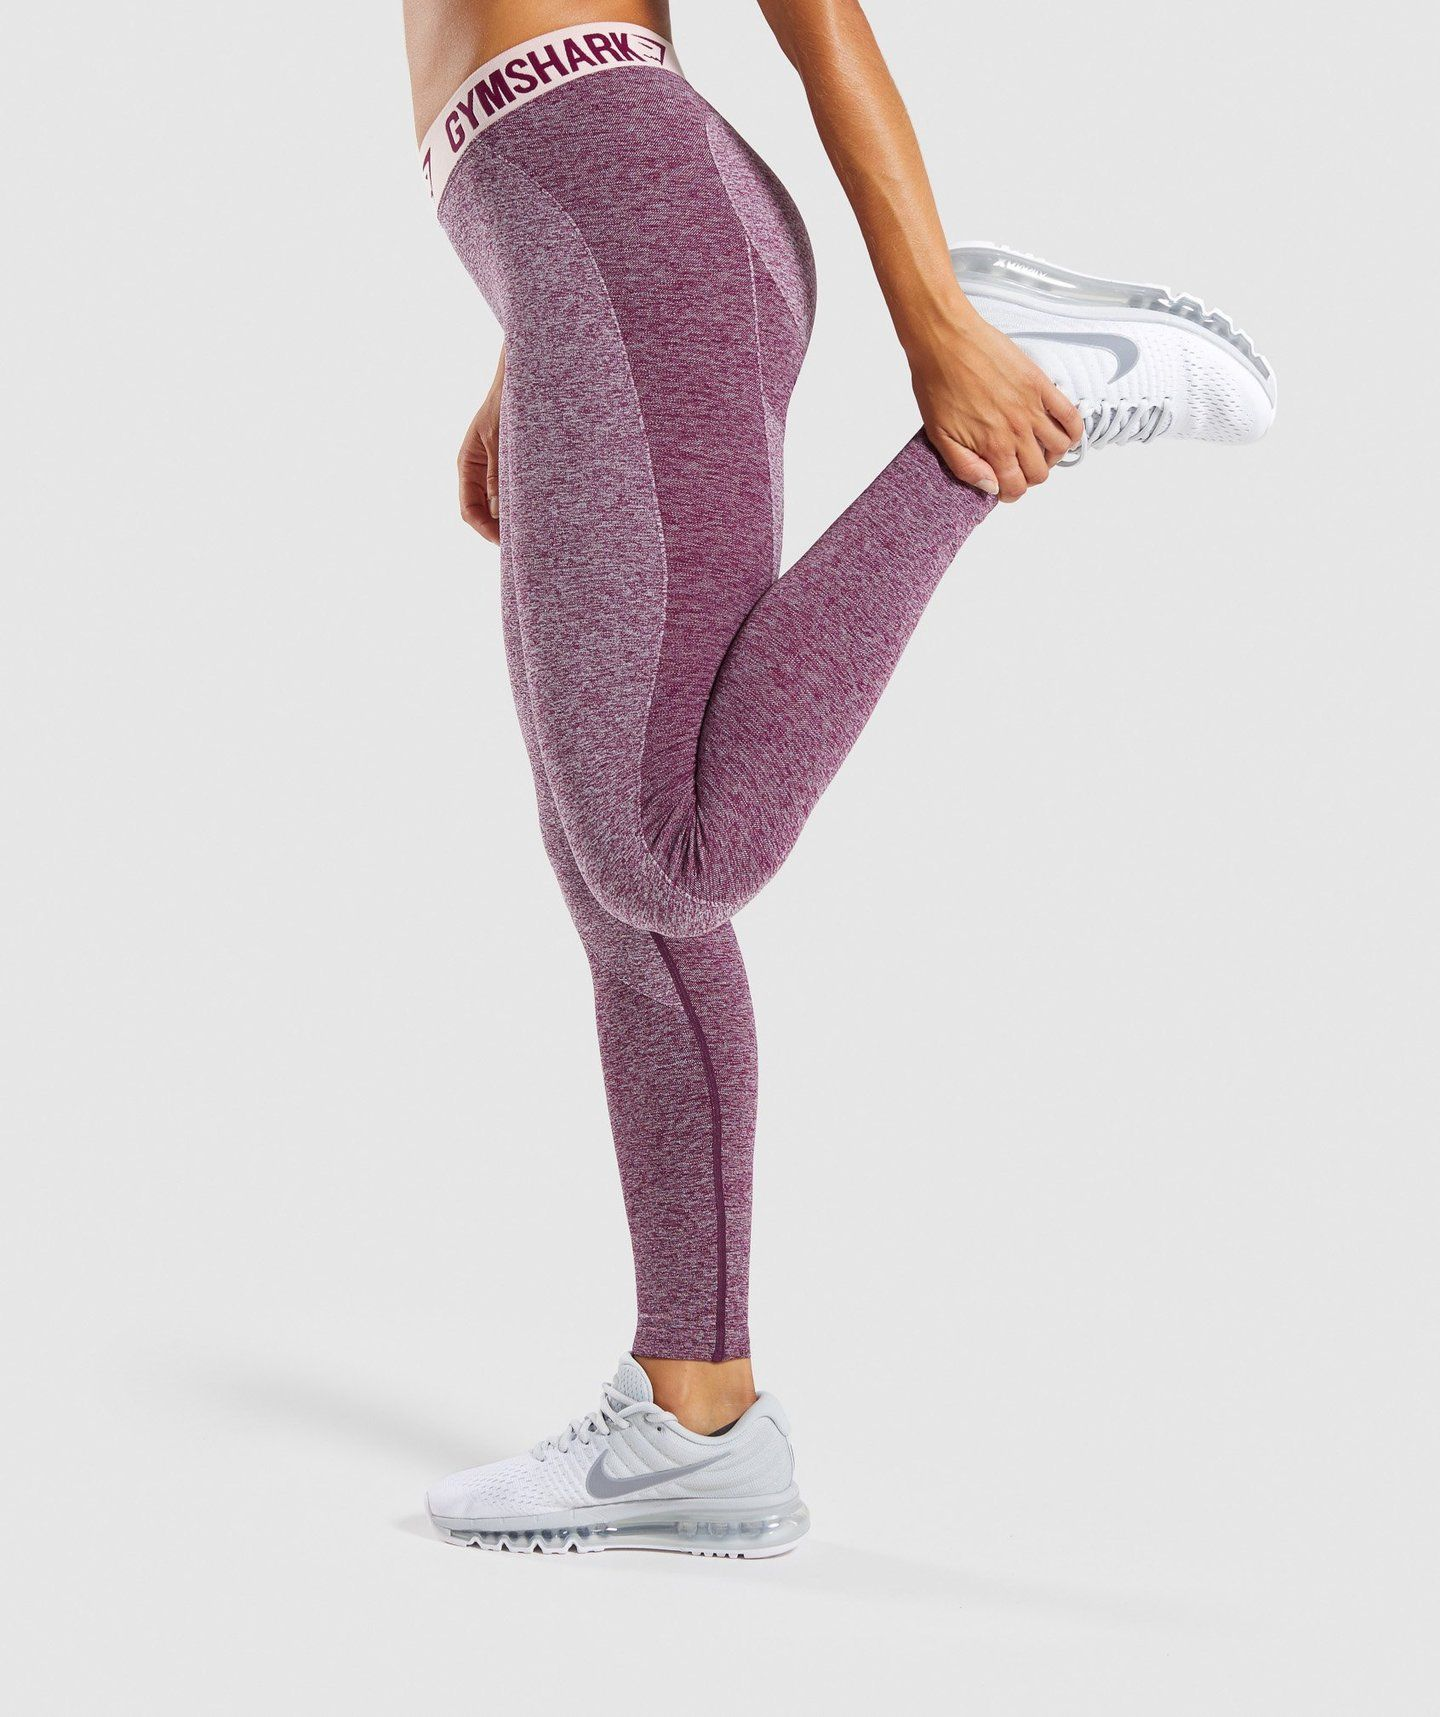 cd00c85f1e1c33 Gymshark Flex Leggings - Dark Ruby Marl/Blush Nude in 2019 ...